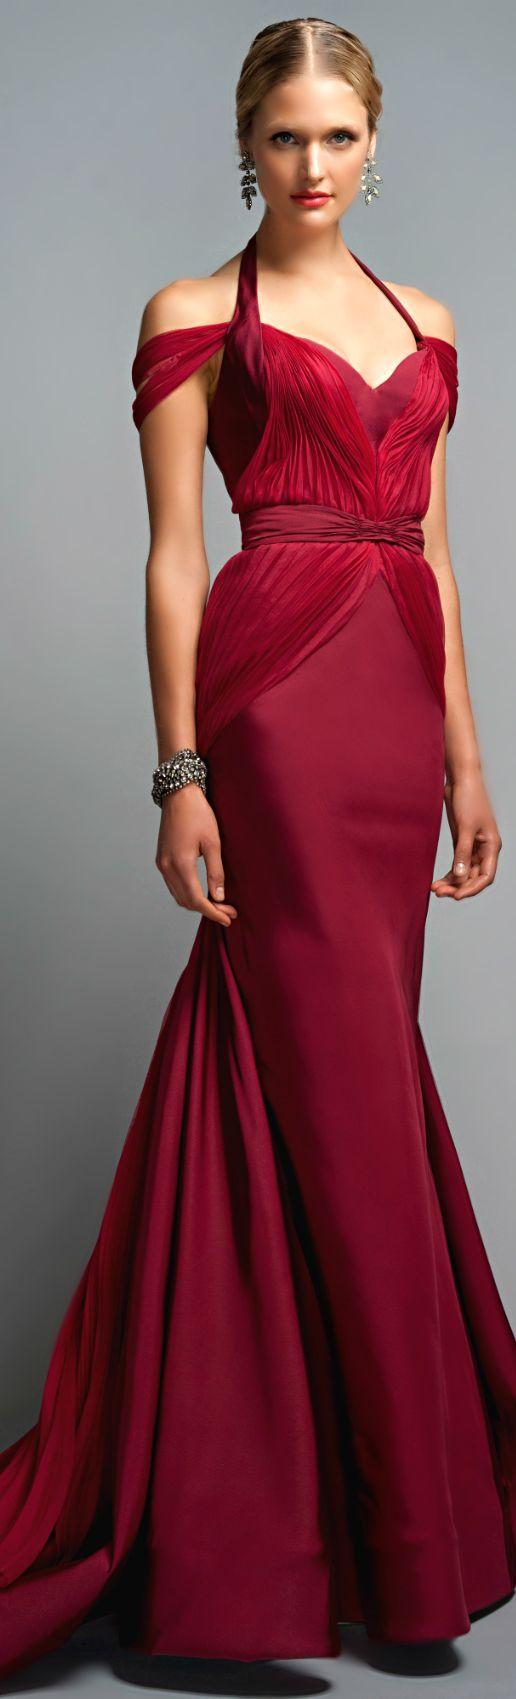 formal christmas dresses choice image - dresses design ideas